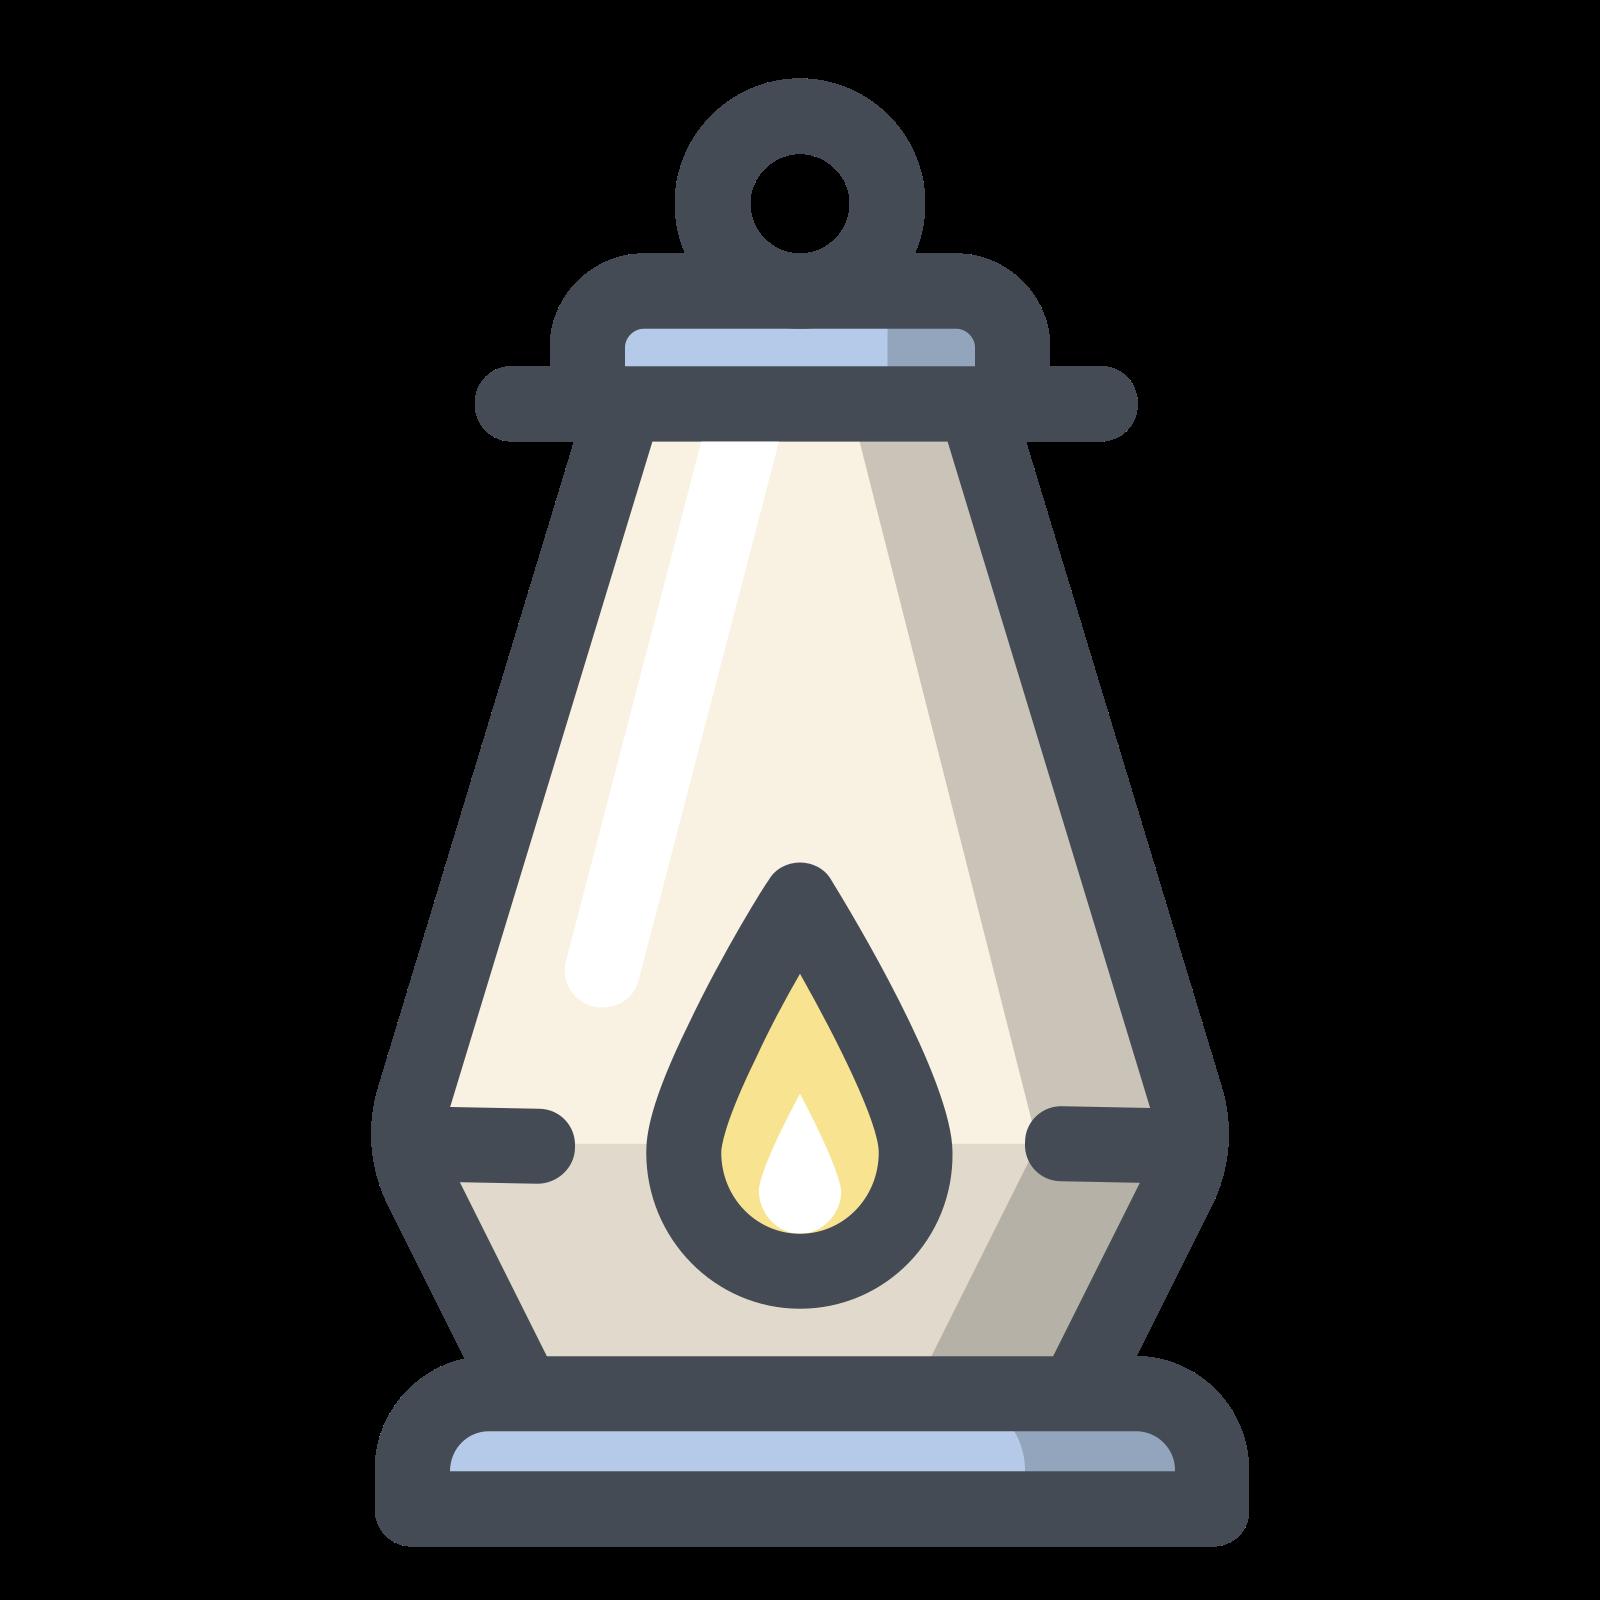 Lampa naftowa icon